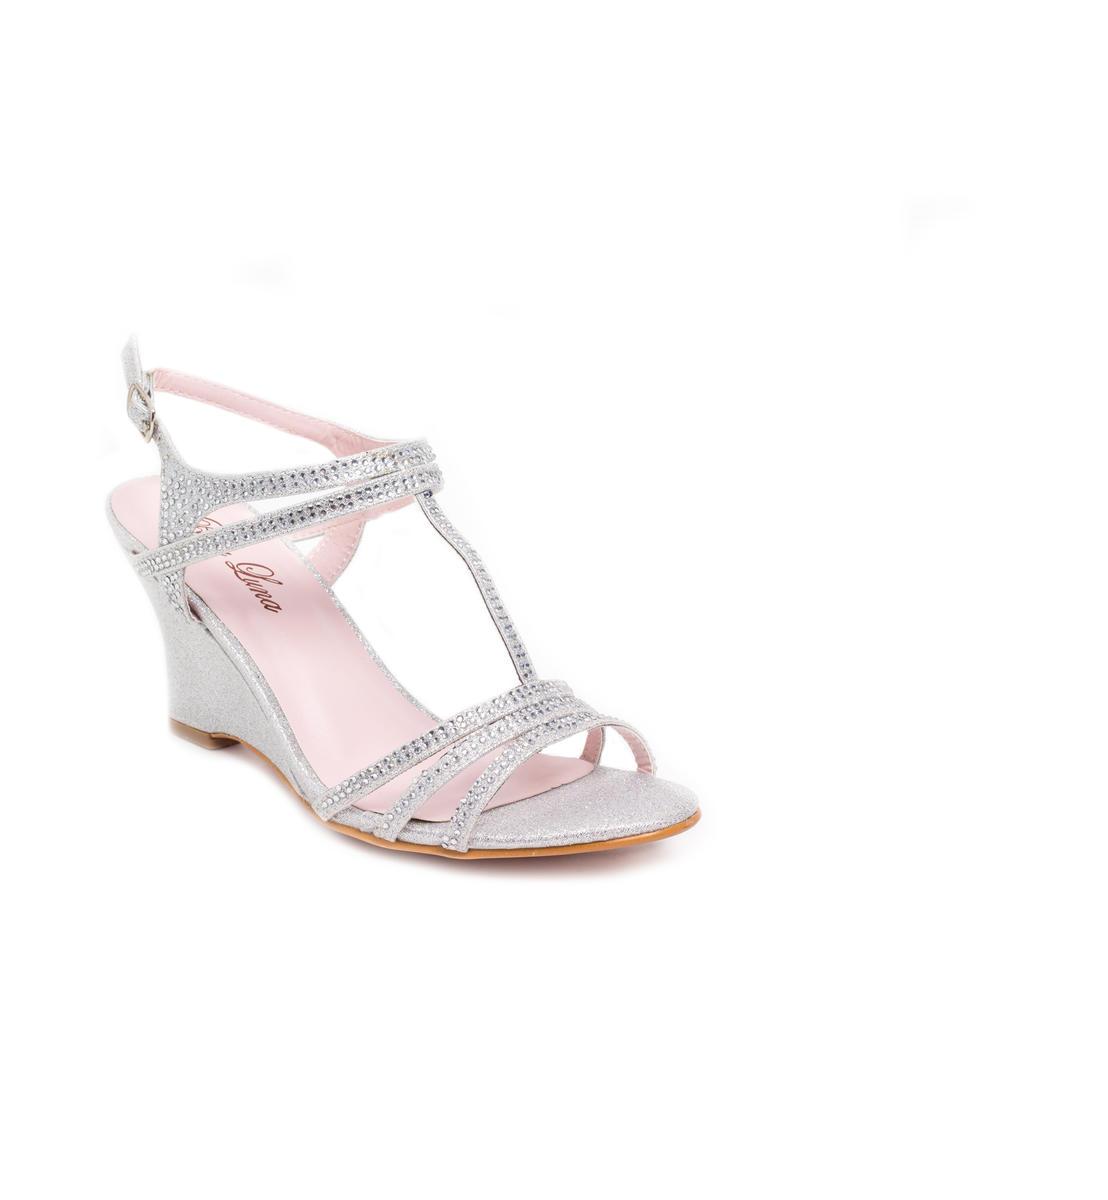 Springland Footwear